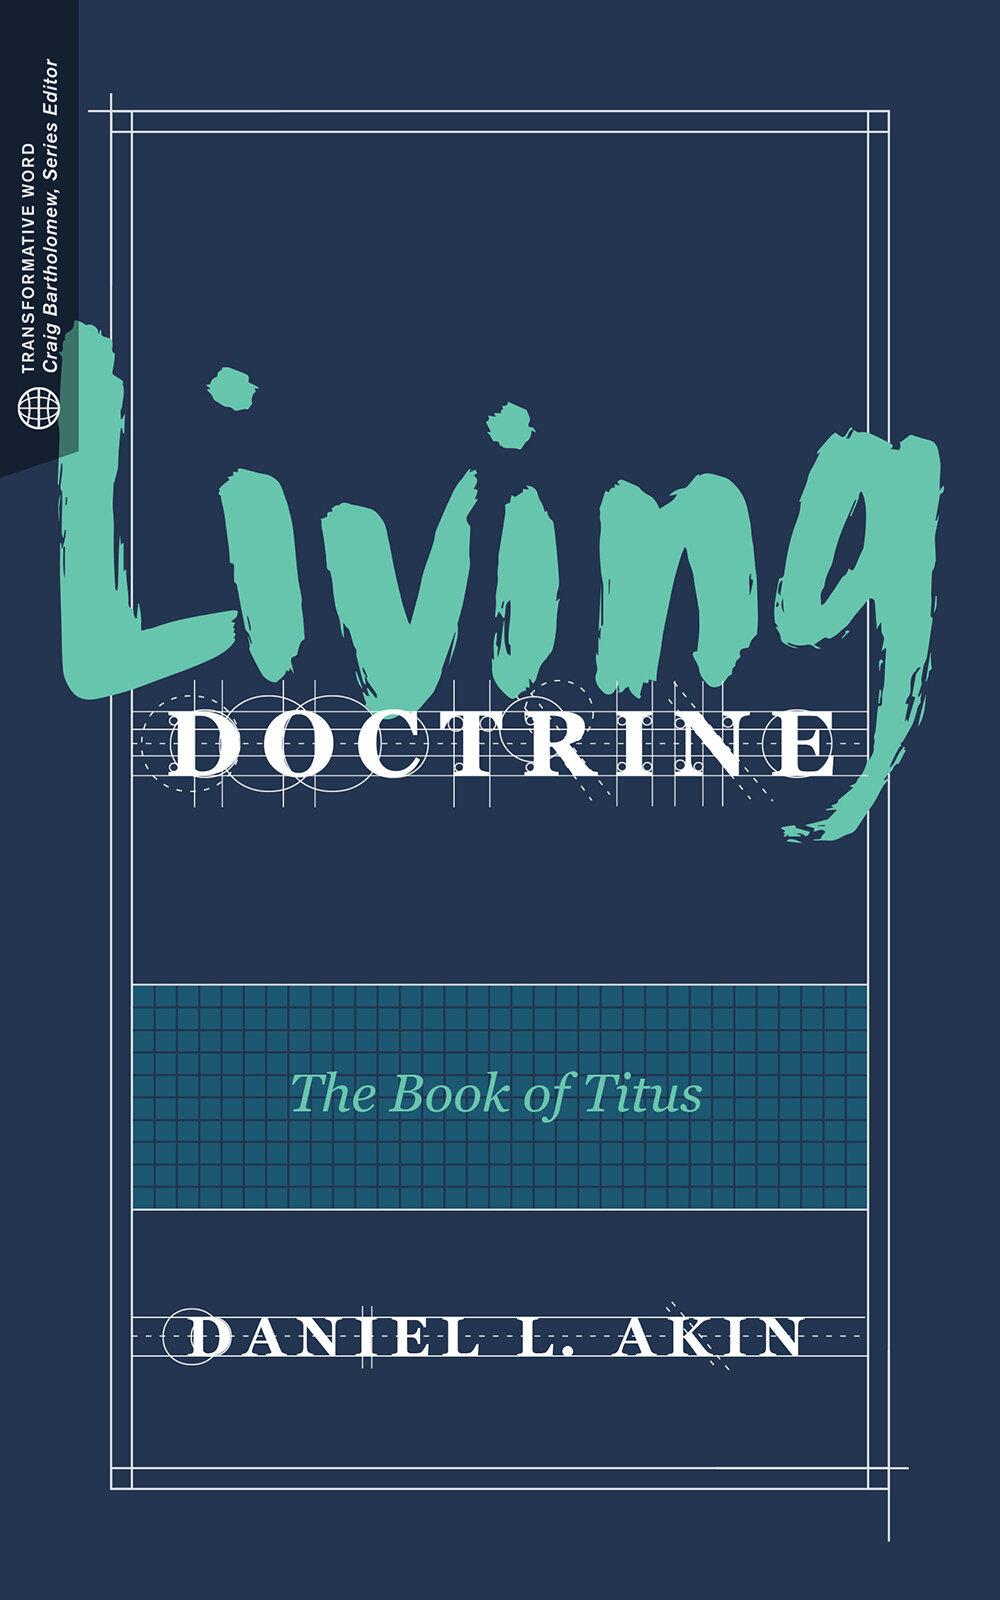 Living Doctrine